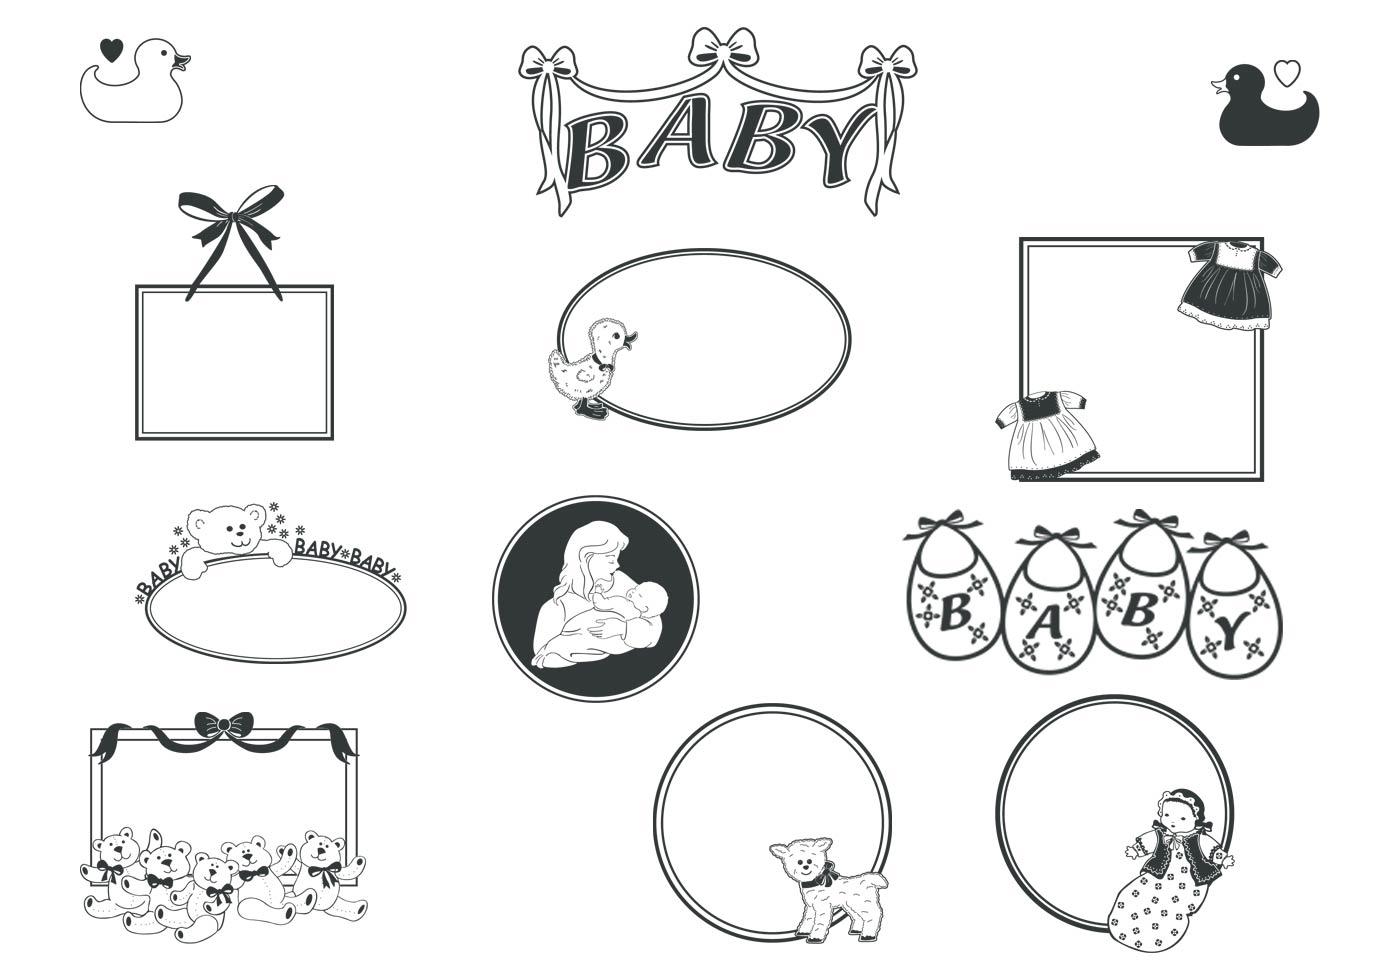 Retro Baby Rahmen Pinsel - Kostenlose Photoshop-Pinsel bei Brusheezy!